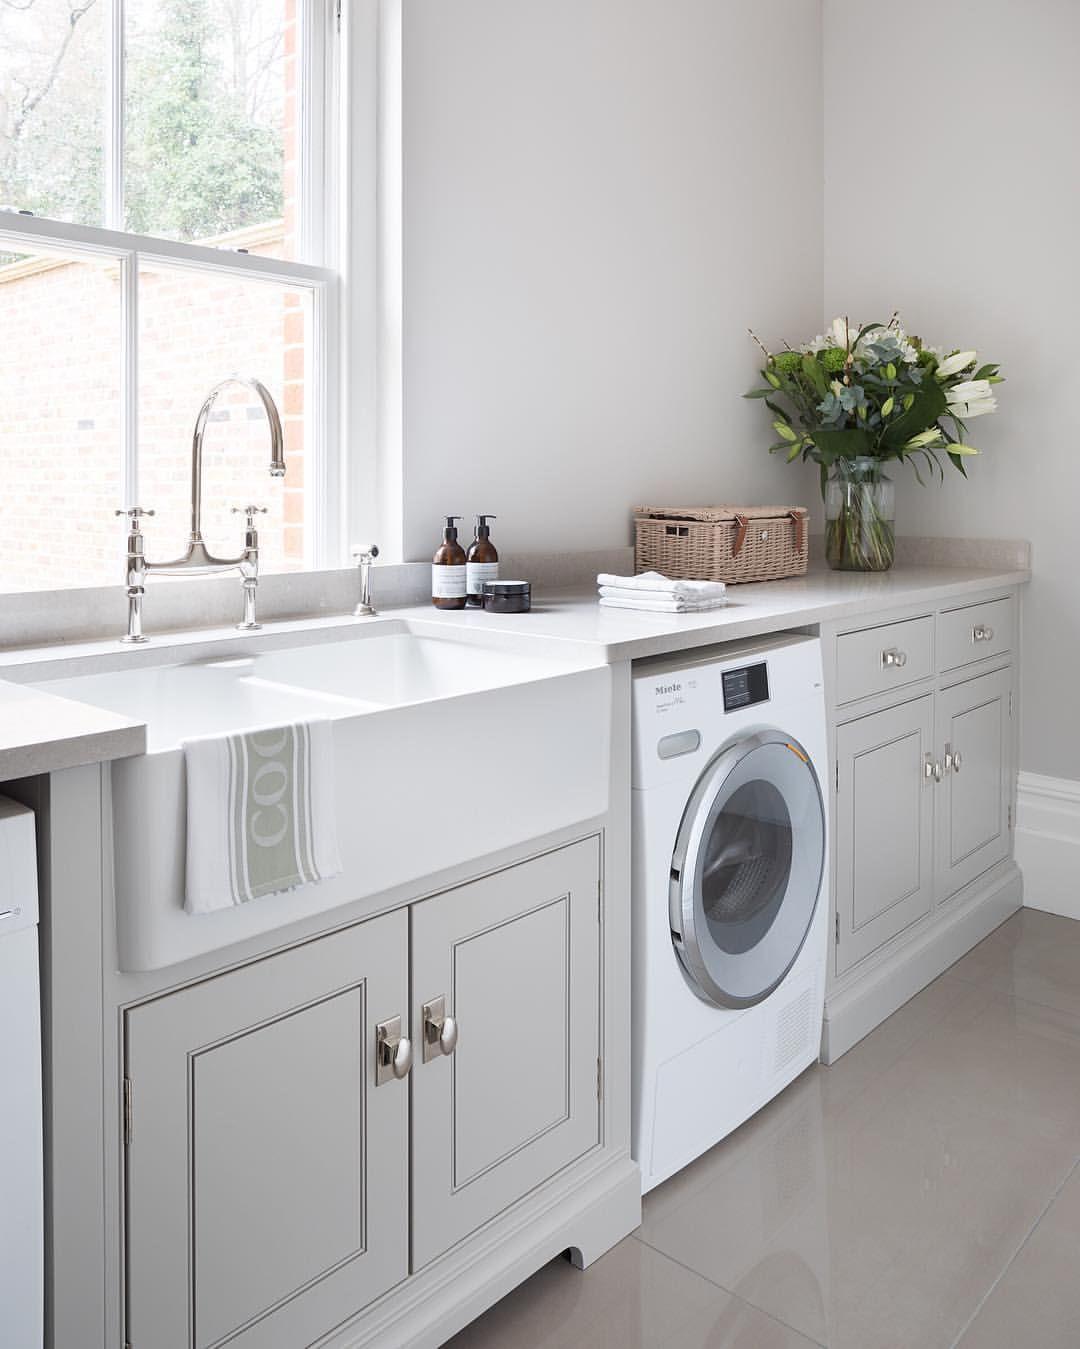 Washing Machine In Kitchen Design: Pin By Erica Ok On Basement Reno In 2019